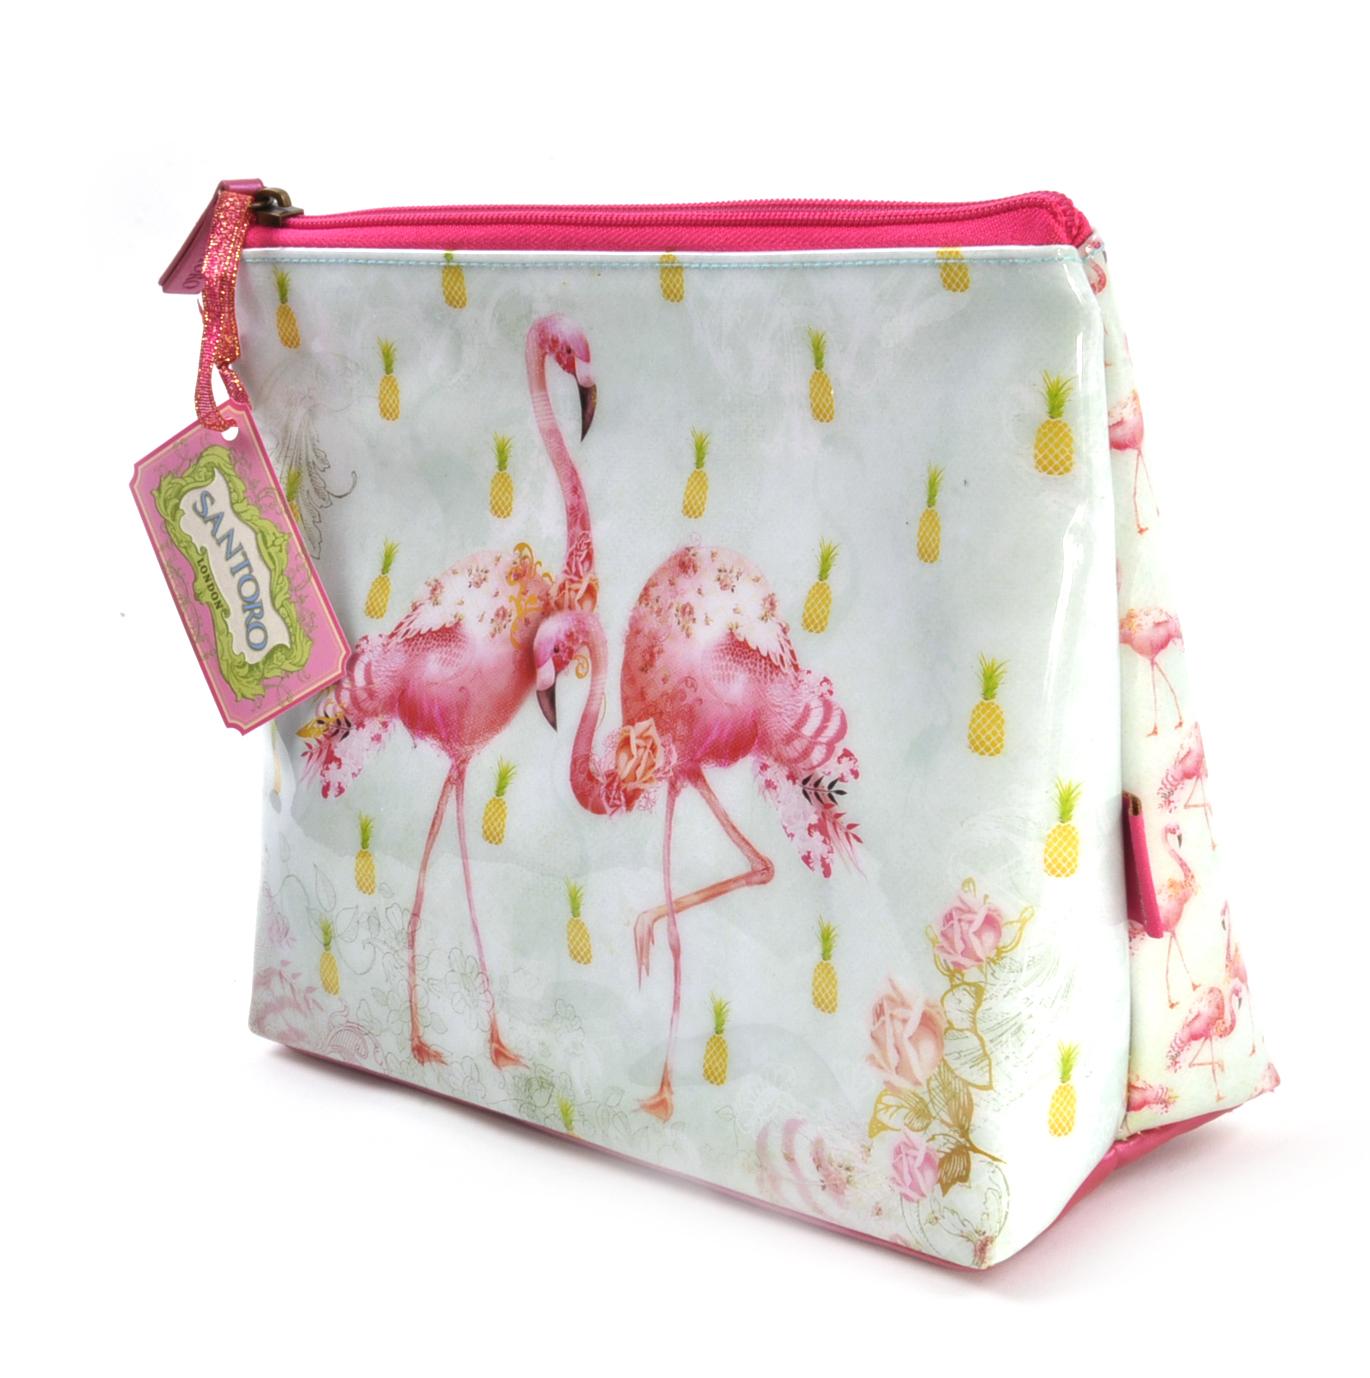 Santoro Pencil or accessory case